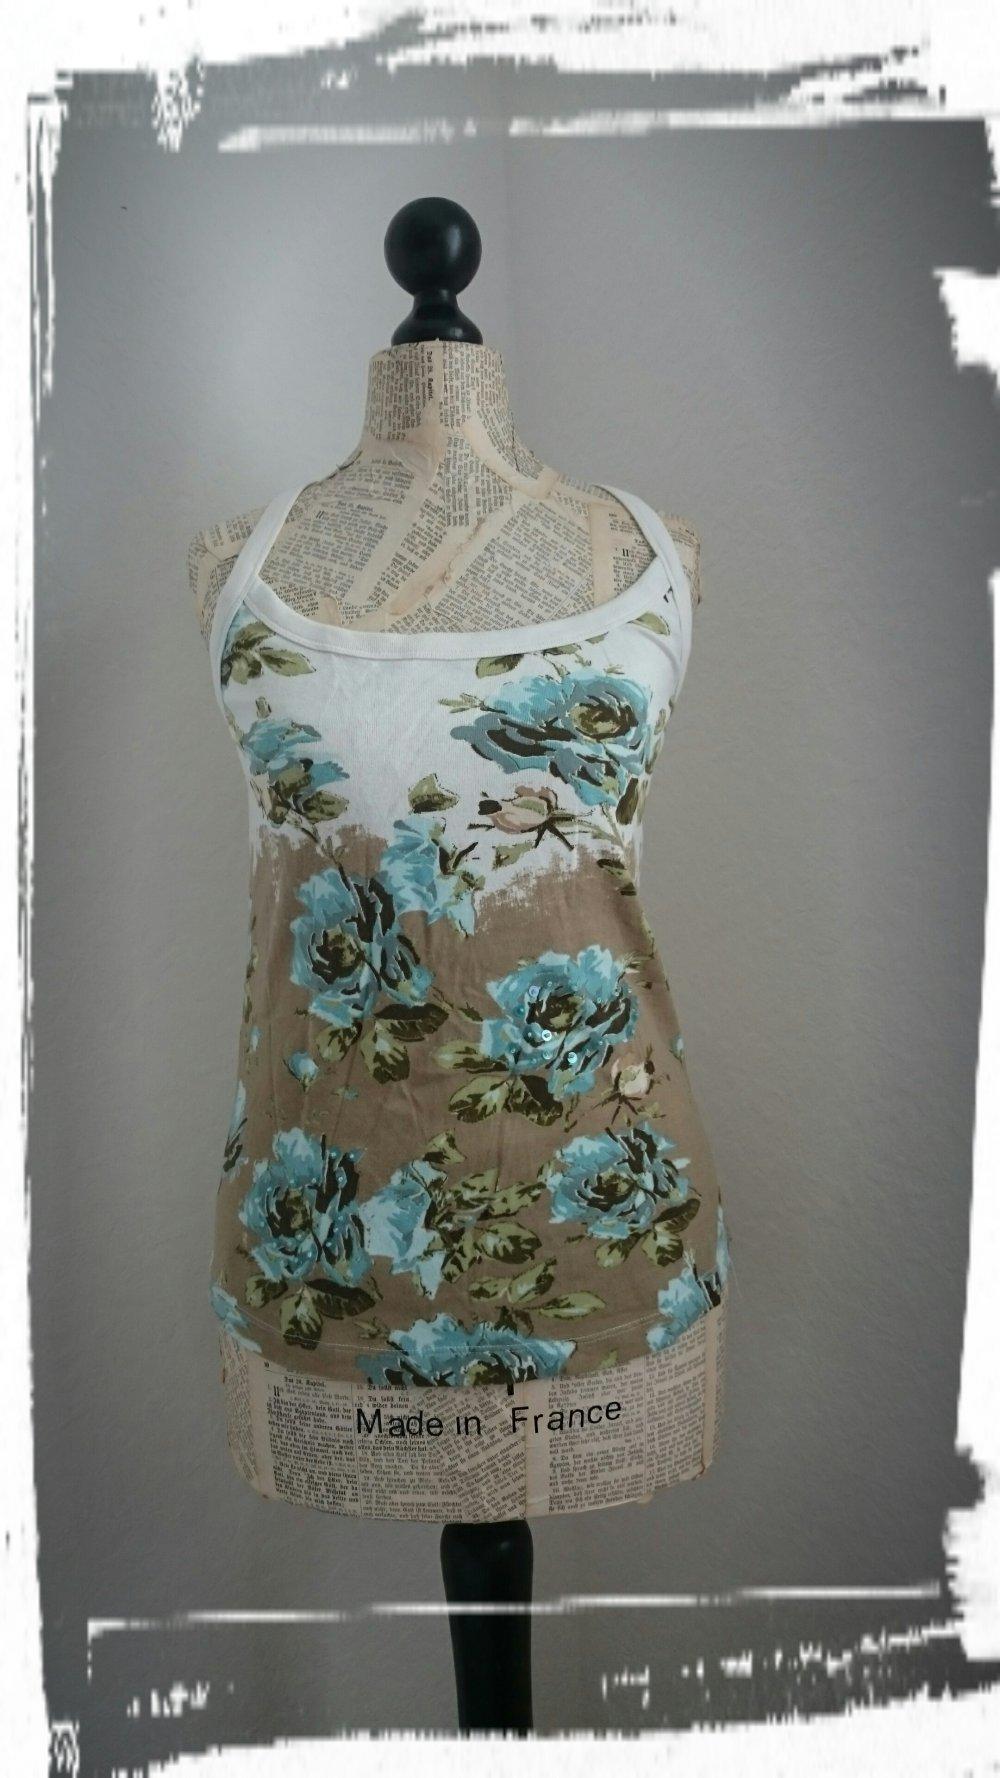 neu! mode vero moda blumen-top , größe xl, np 29,95 euro